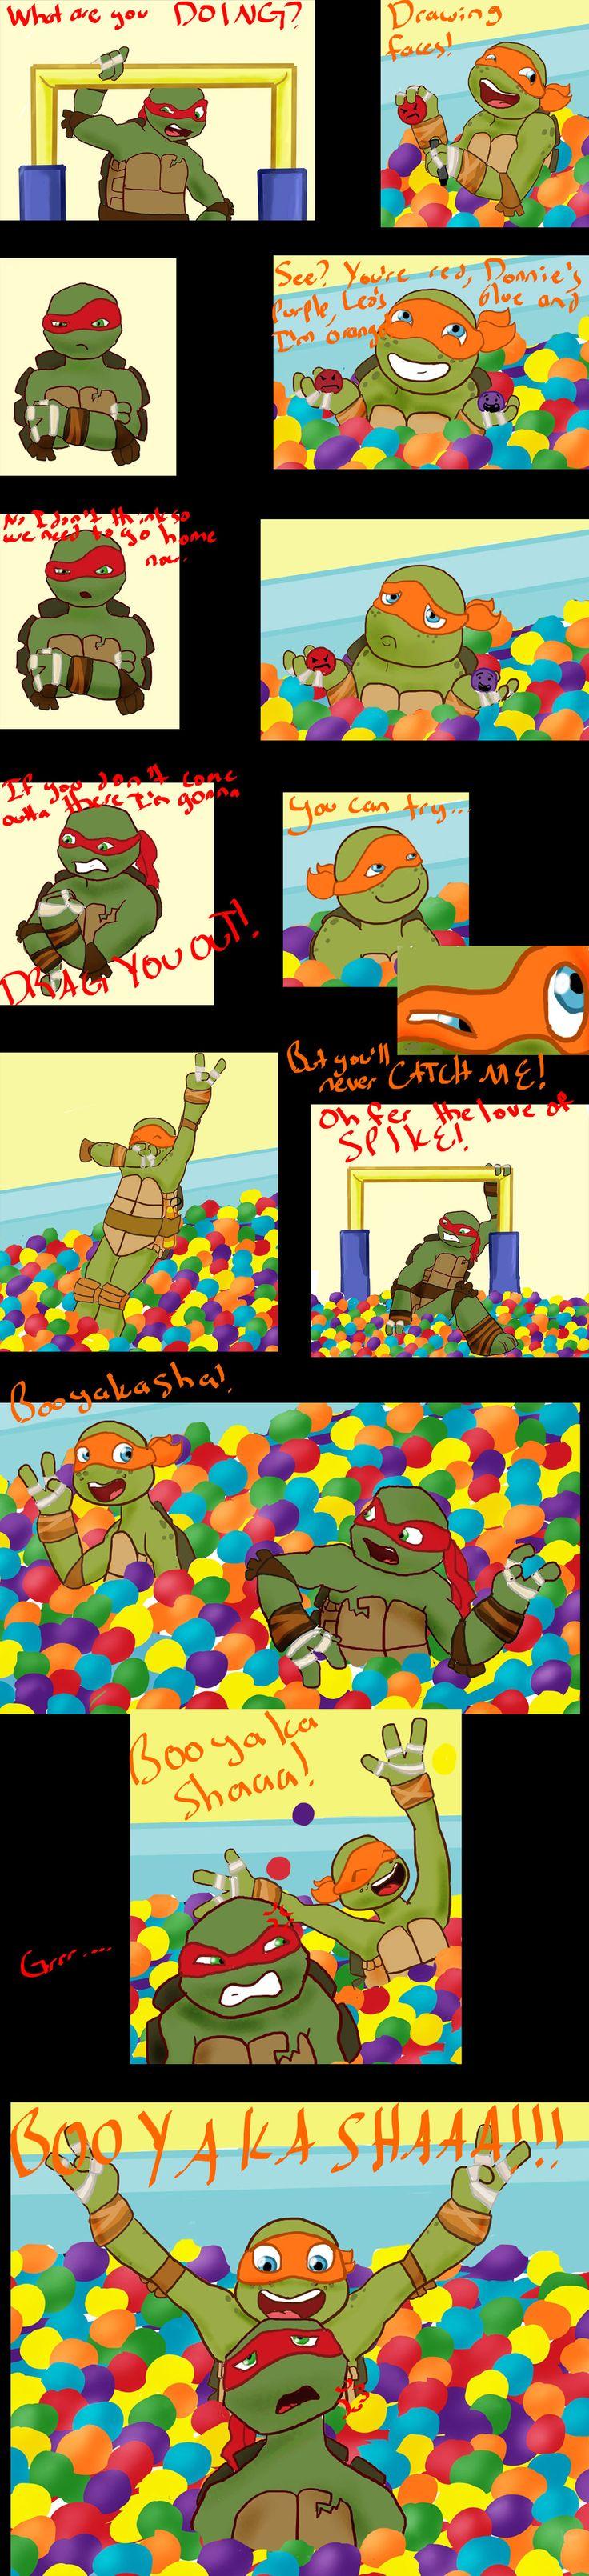 The Big Turtle Theory: Booyakasha In The Ball Pitby *craZkid